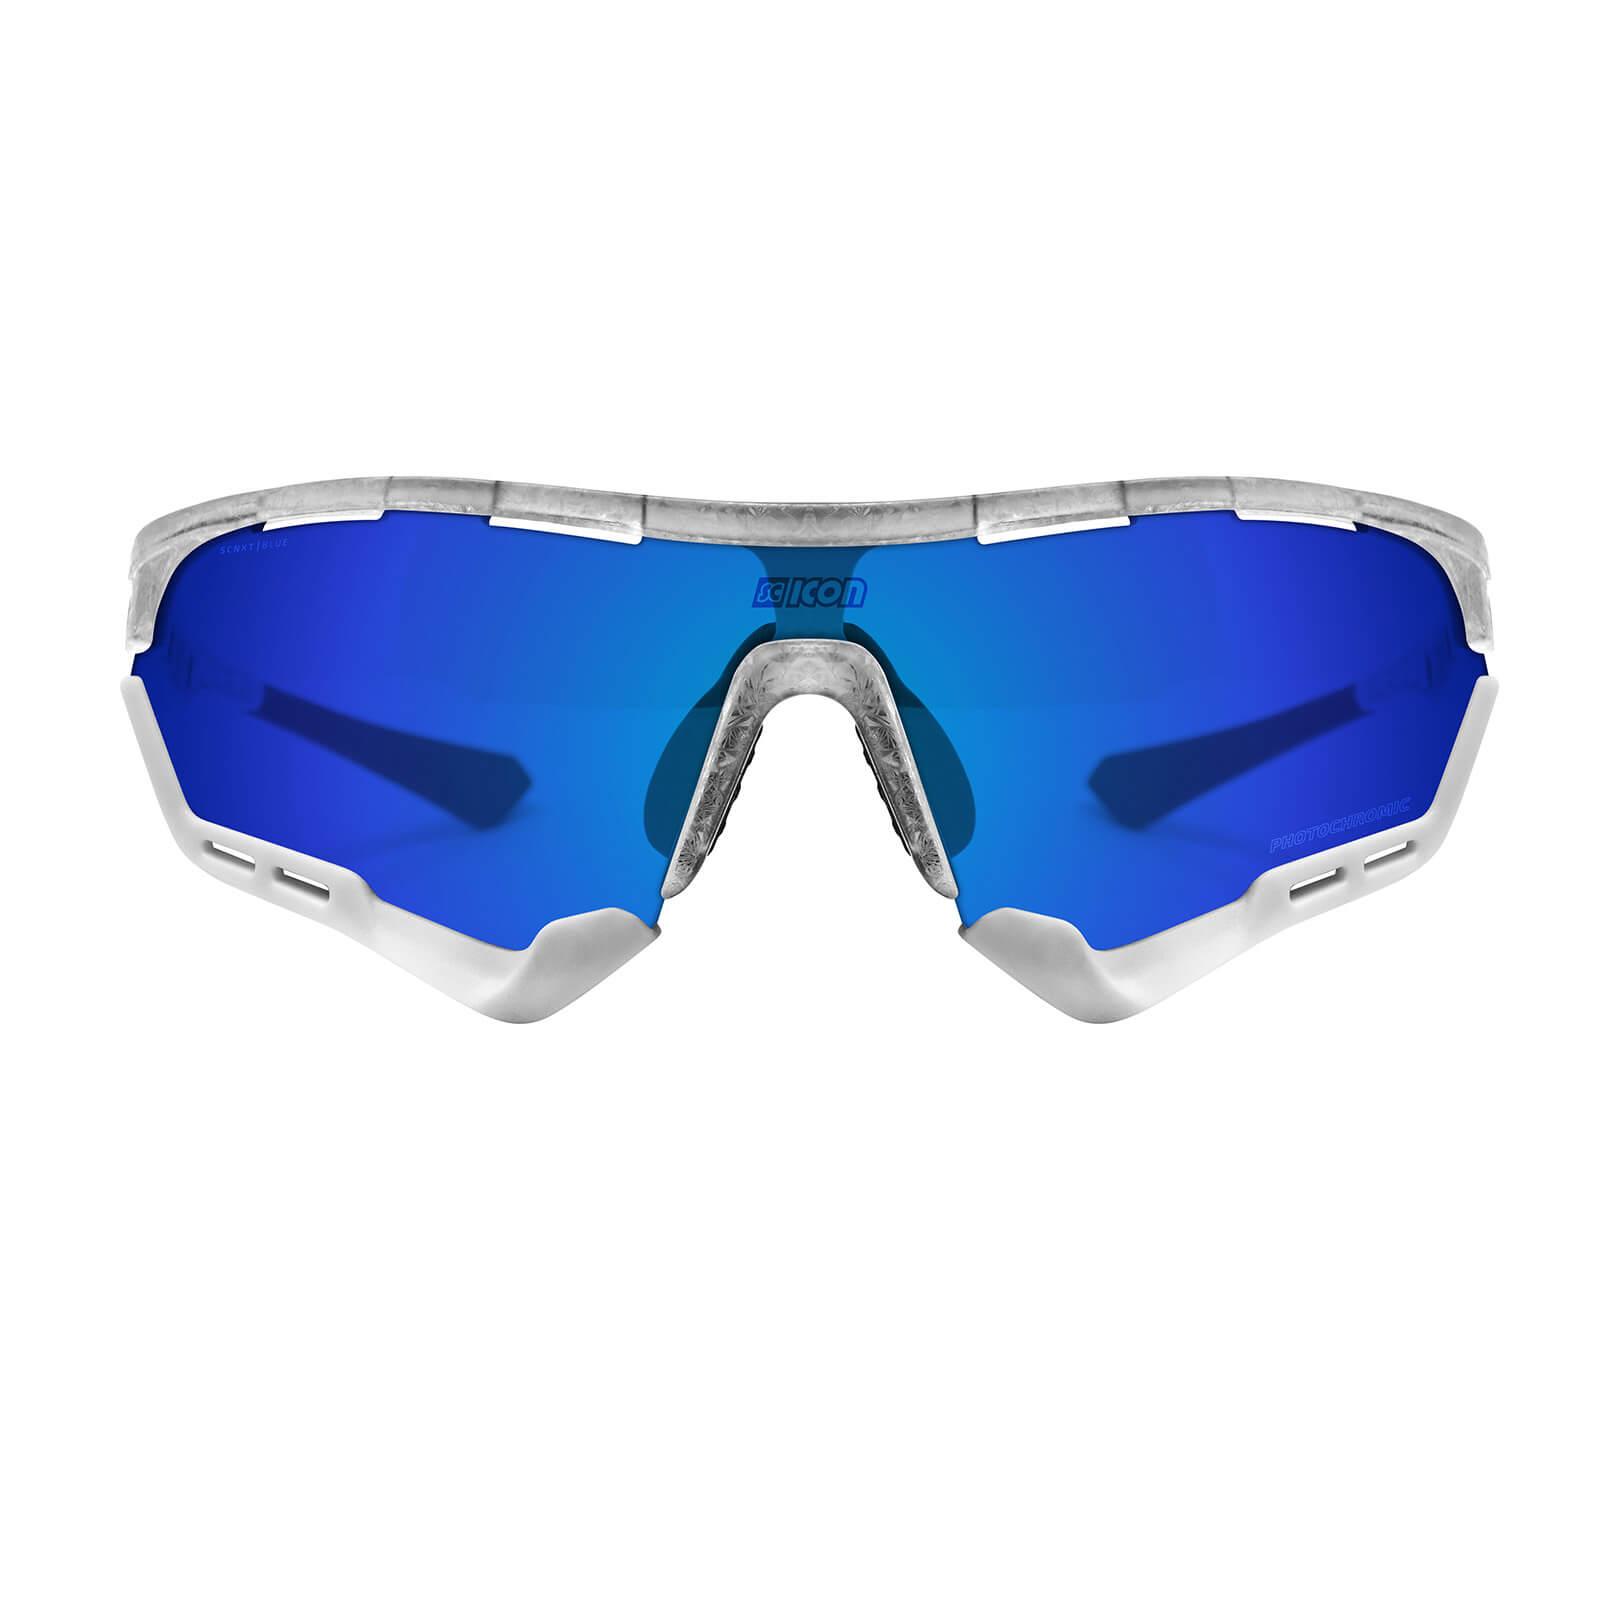 Scicon Aerotech Sunglasses SCN-XT Photochromic Blue Mirror Lens - Frozen Matt Frame - Standard Lens